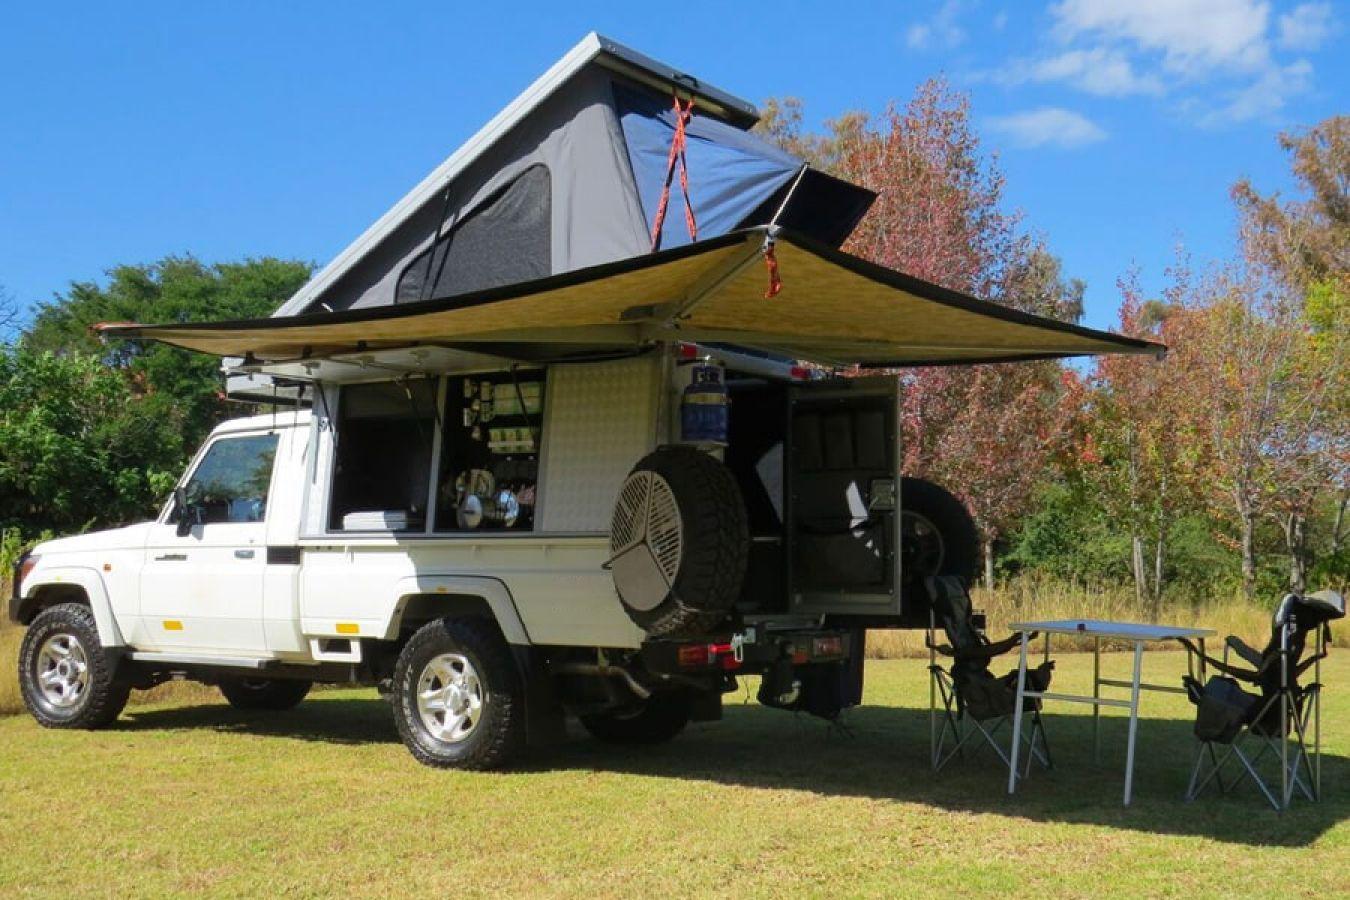 Toyota Landcruiser Bush Camper tent uitgeklapt